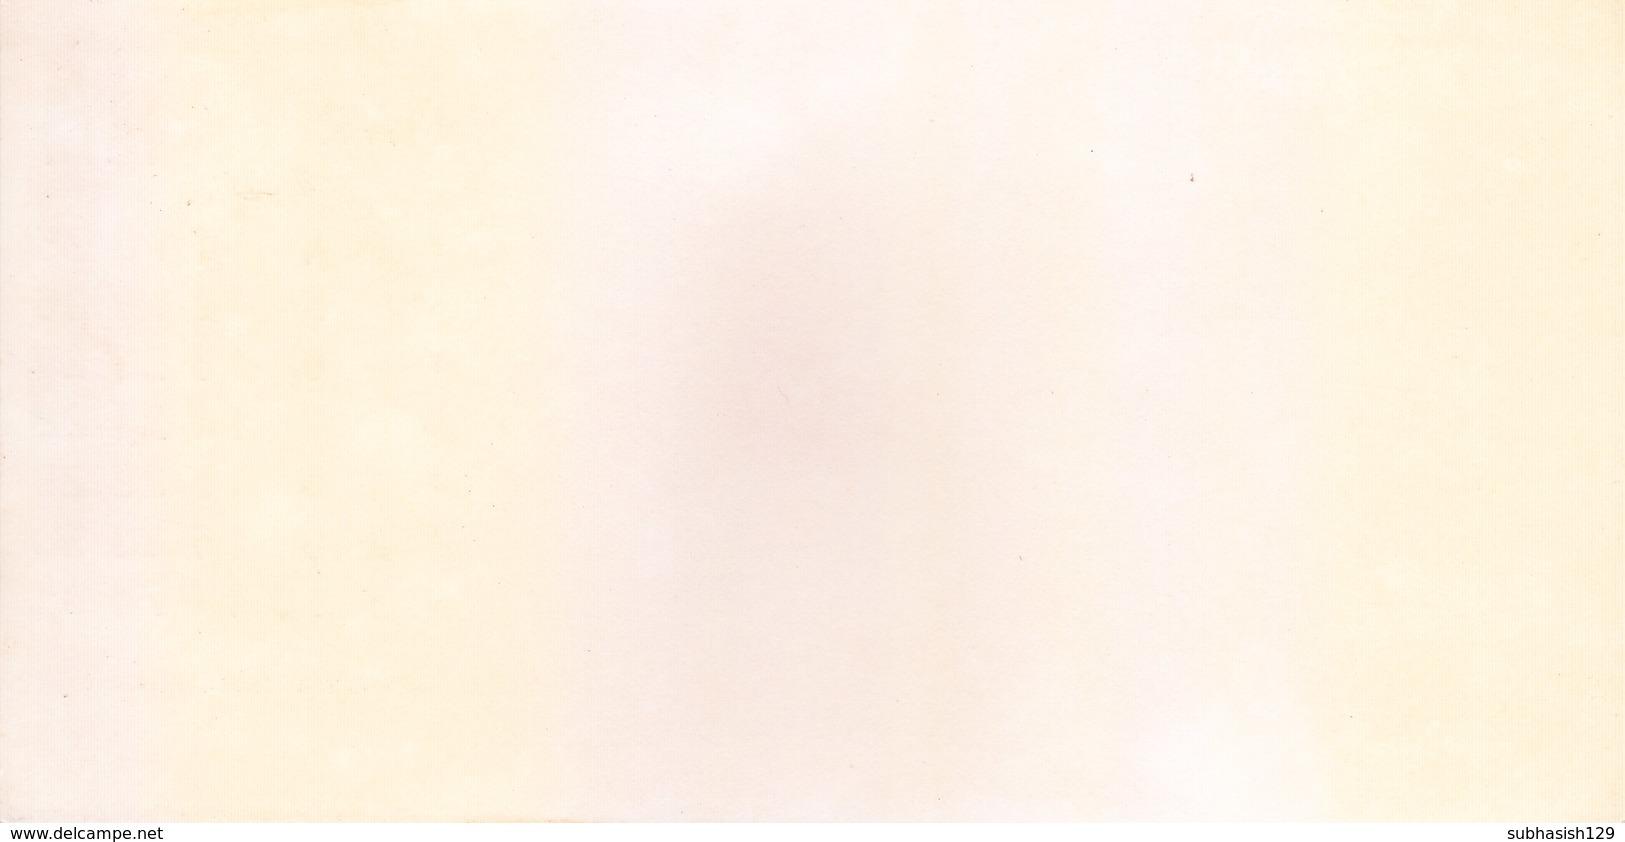 INDIA - RARE AND OLD PAPER CALENDAR - DECEMBER 1973 -  PRINTED HAND SKETCH - CHURCH, MYSORE - ANTIQUE ITEM - Big : 1971-80